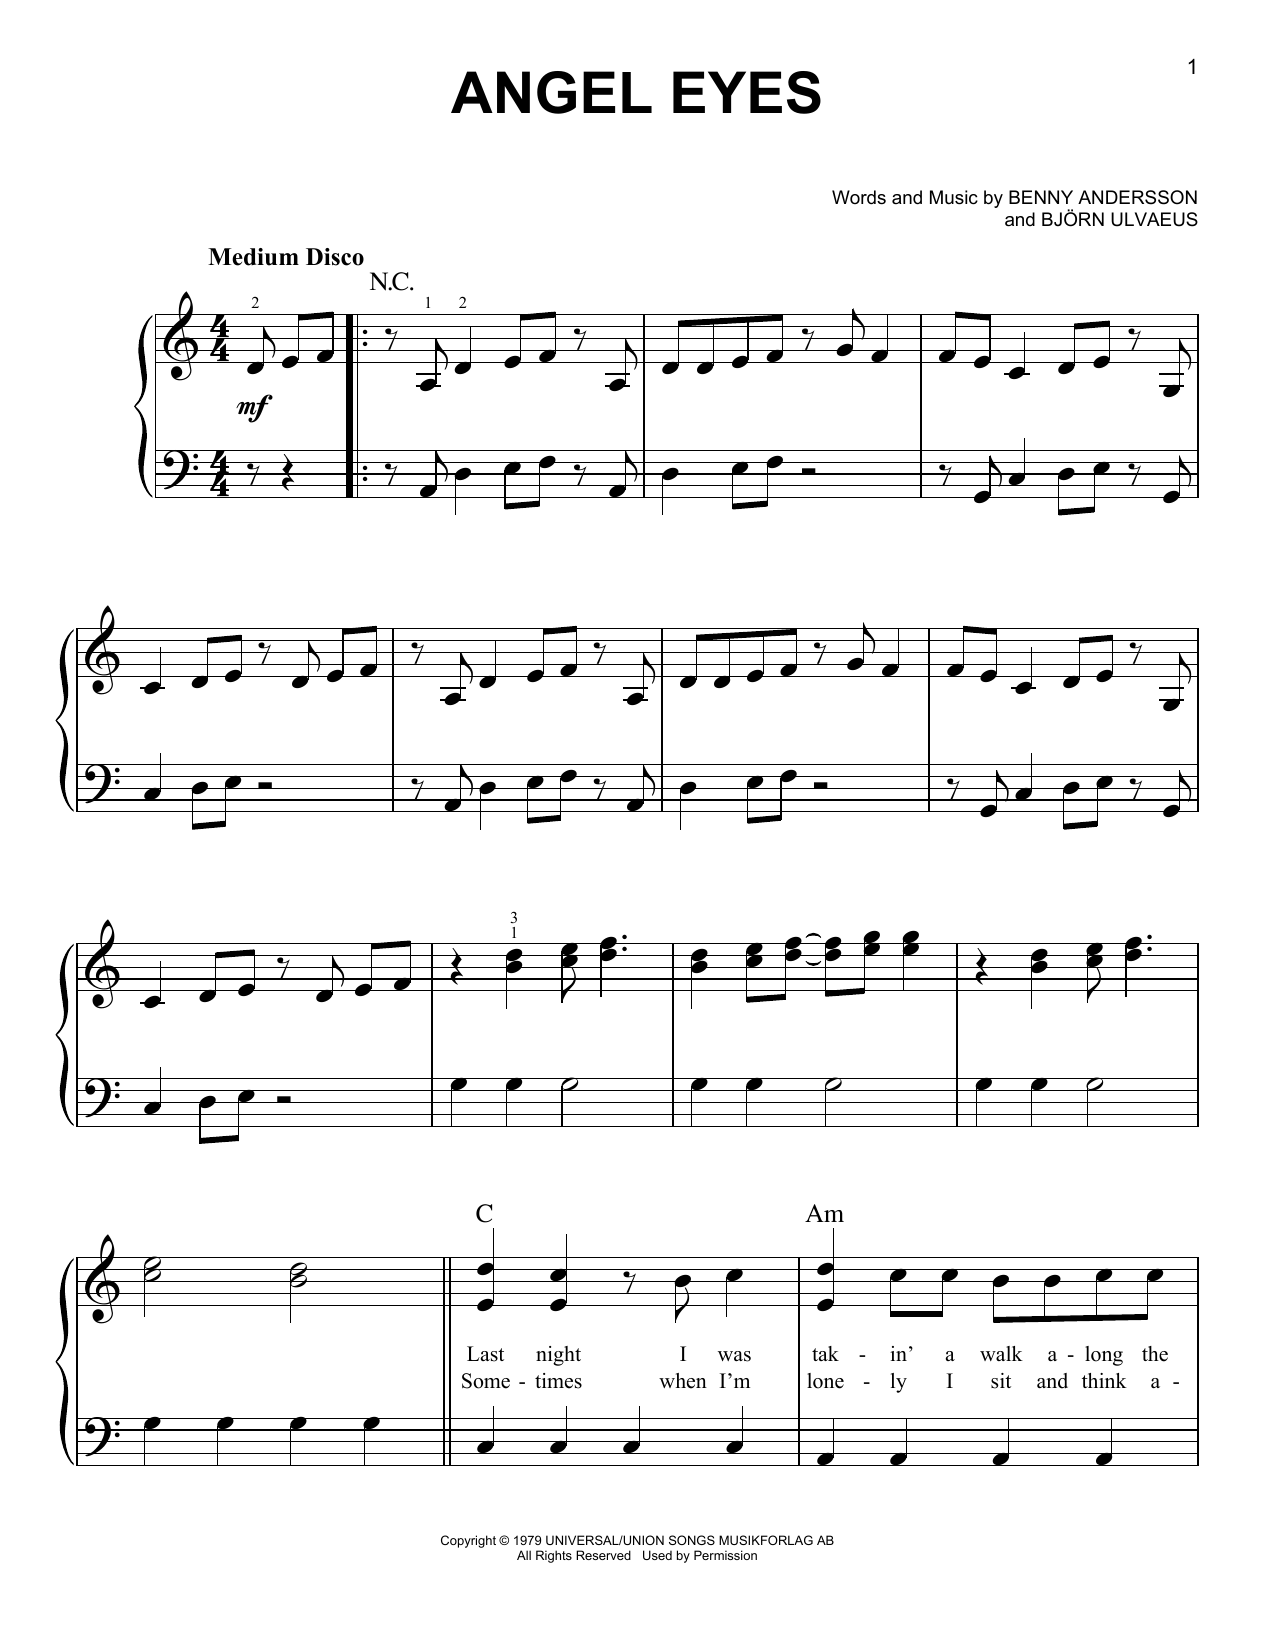 Mamma Mia Angel Eyes Sheet Music, Piano Notes, Chords